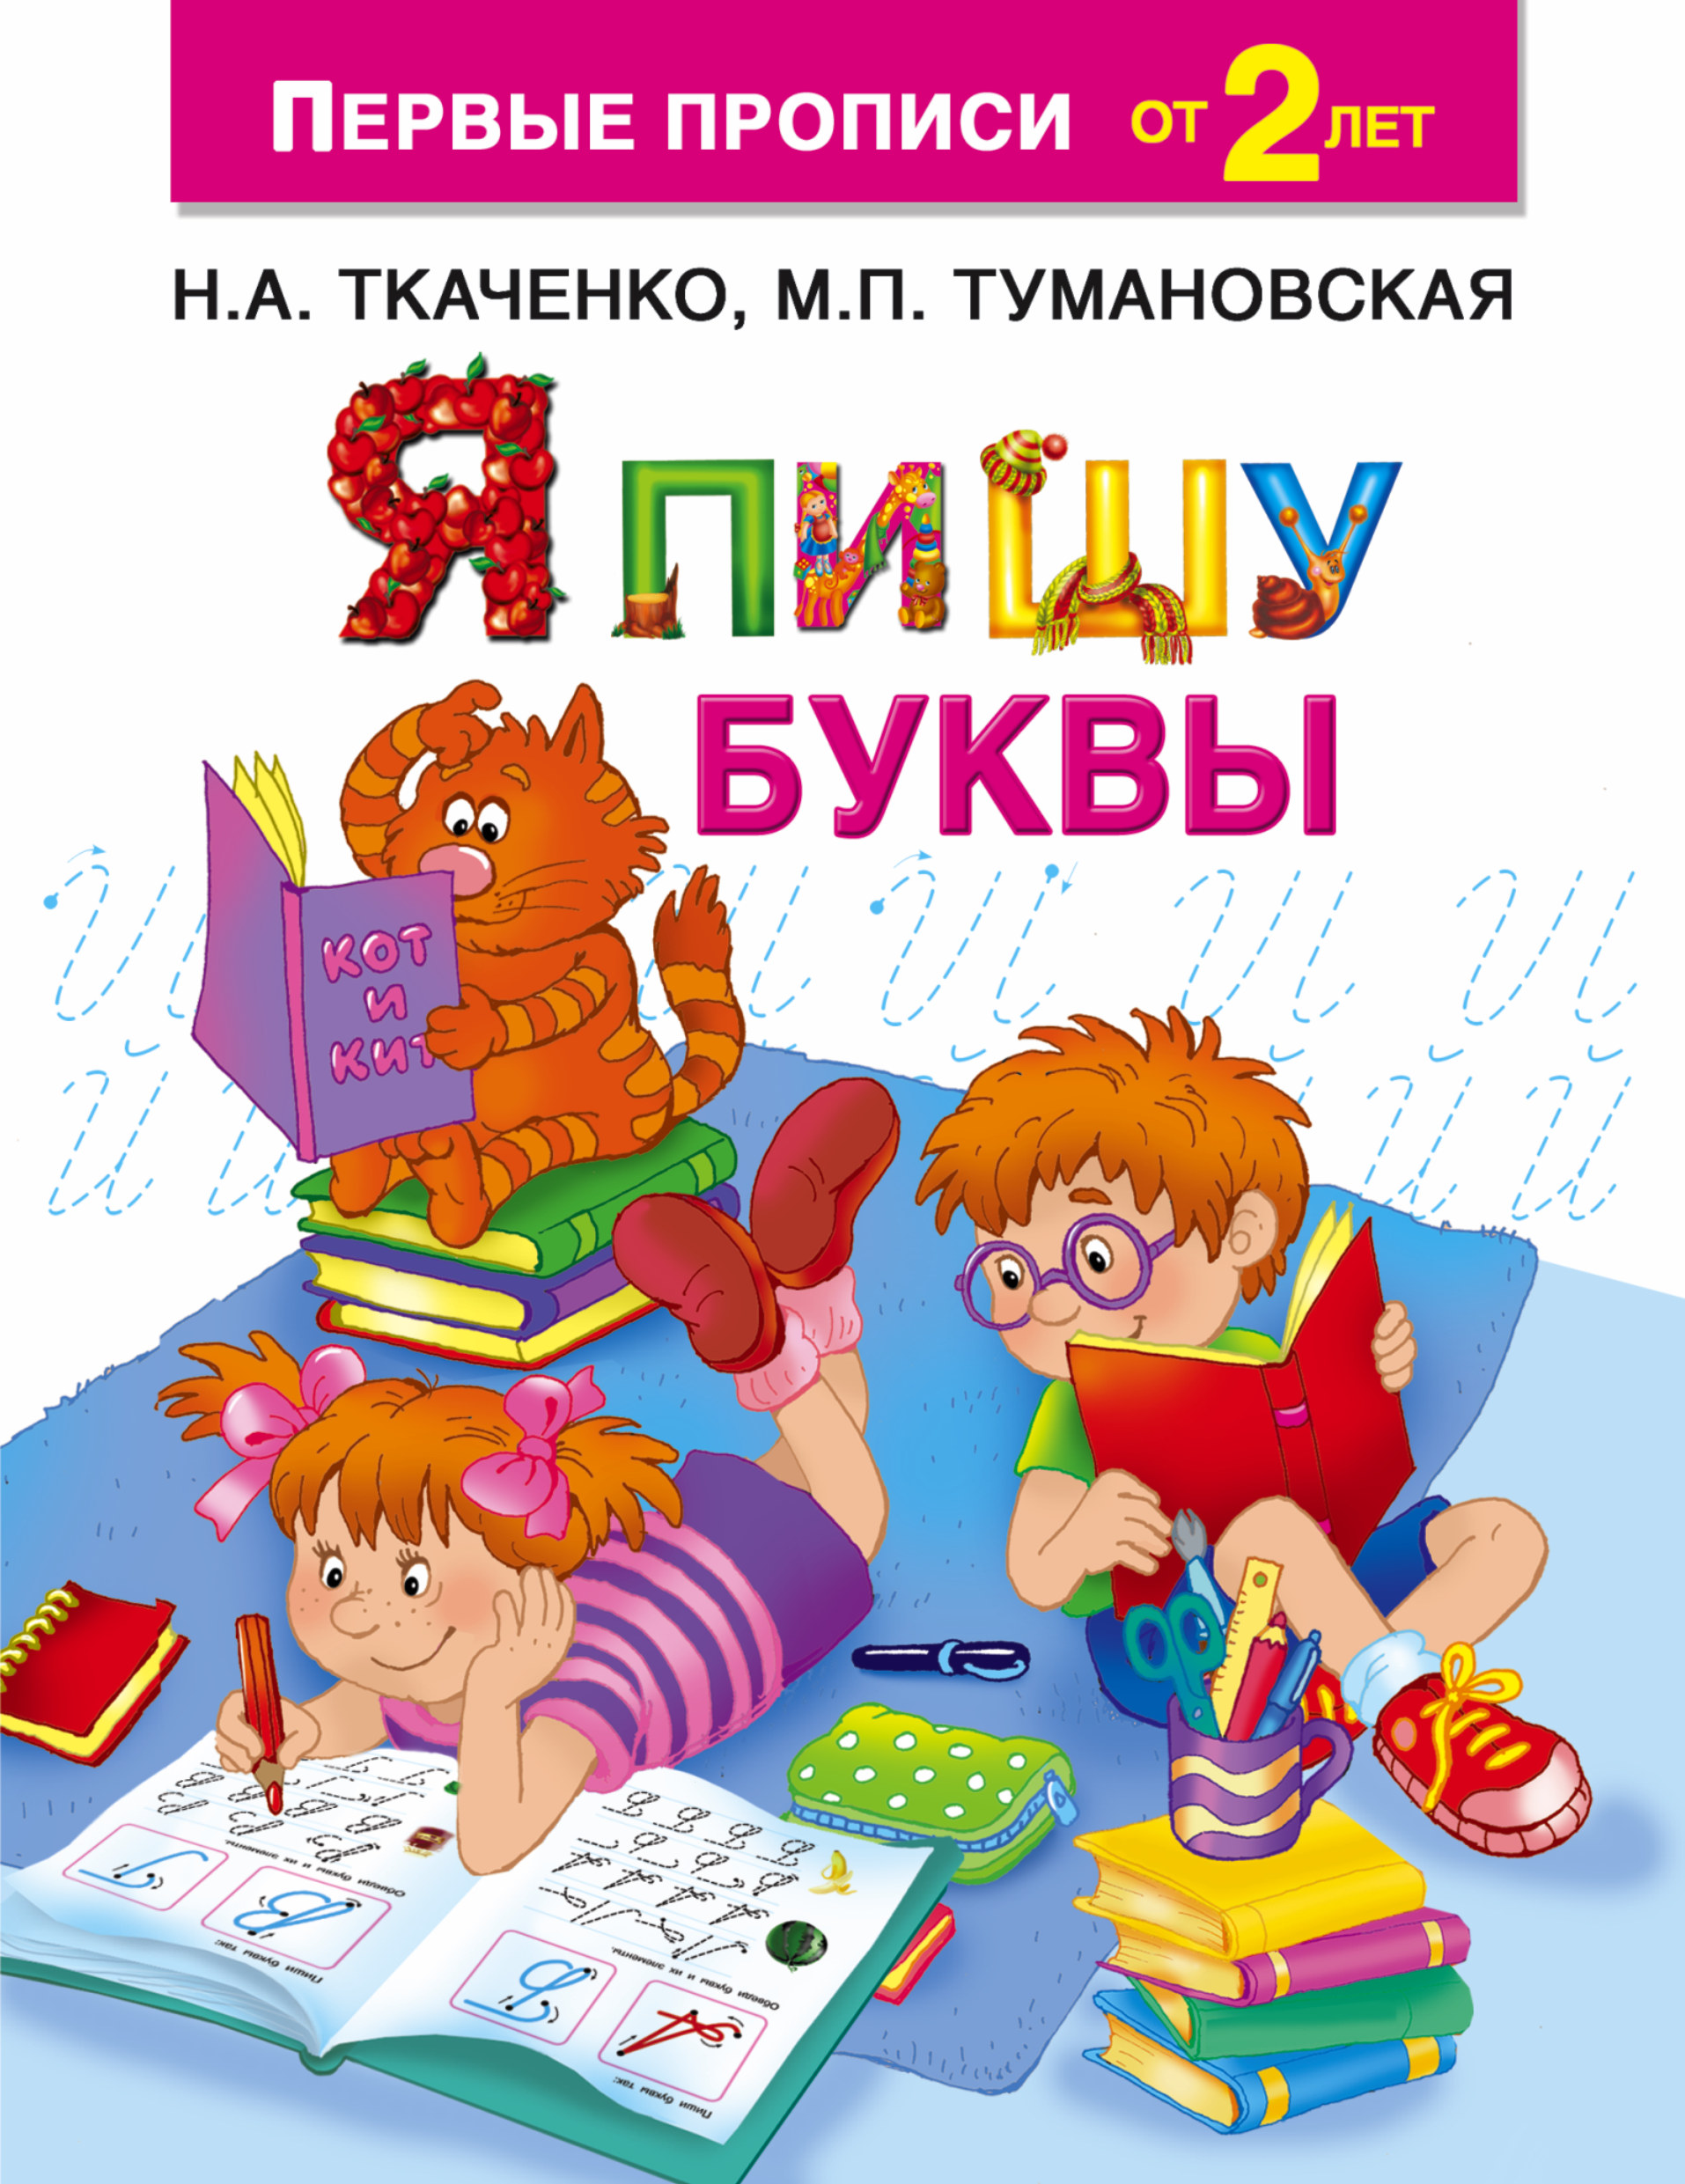 Ткаченко Н.А., Тумановская М.П. Я пишу буквы ISBN: 978-5-17-101933-4 книги эксмо пишу буквы 5 6 лет